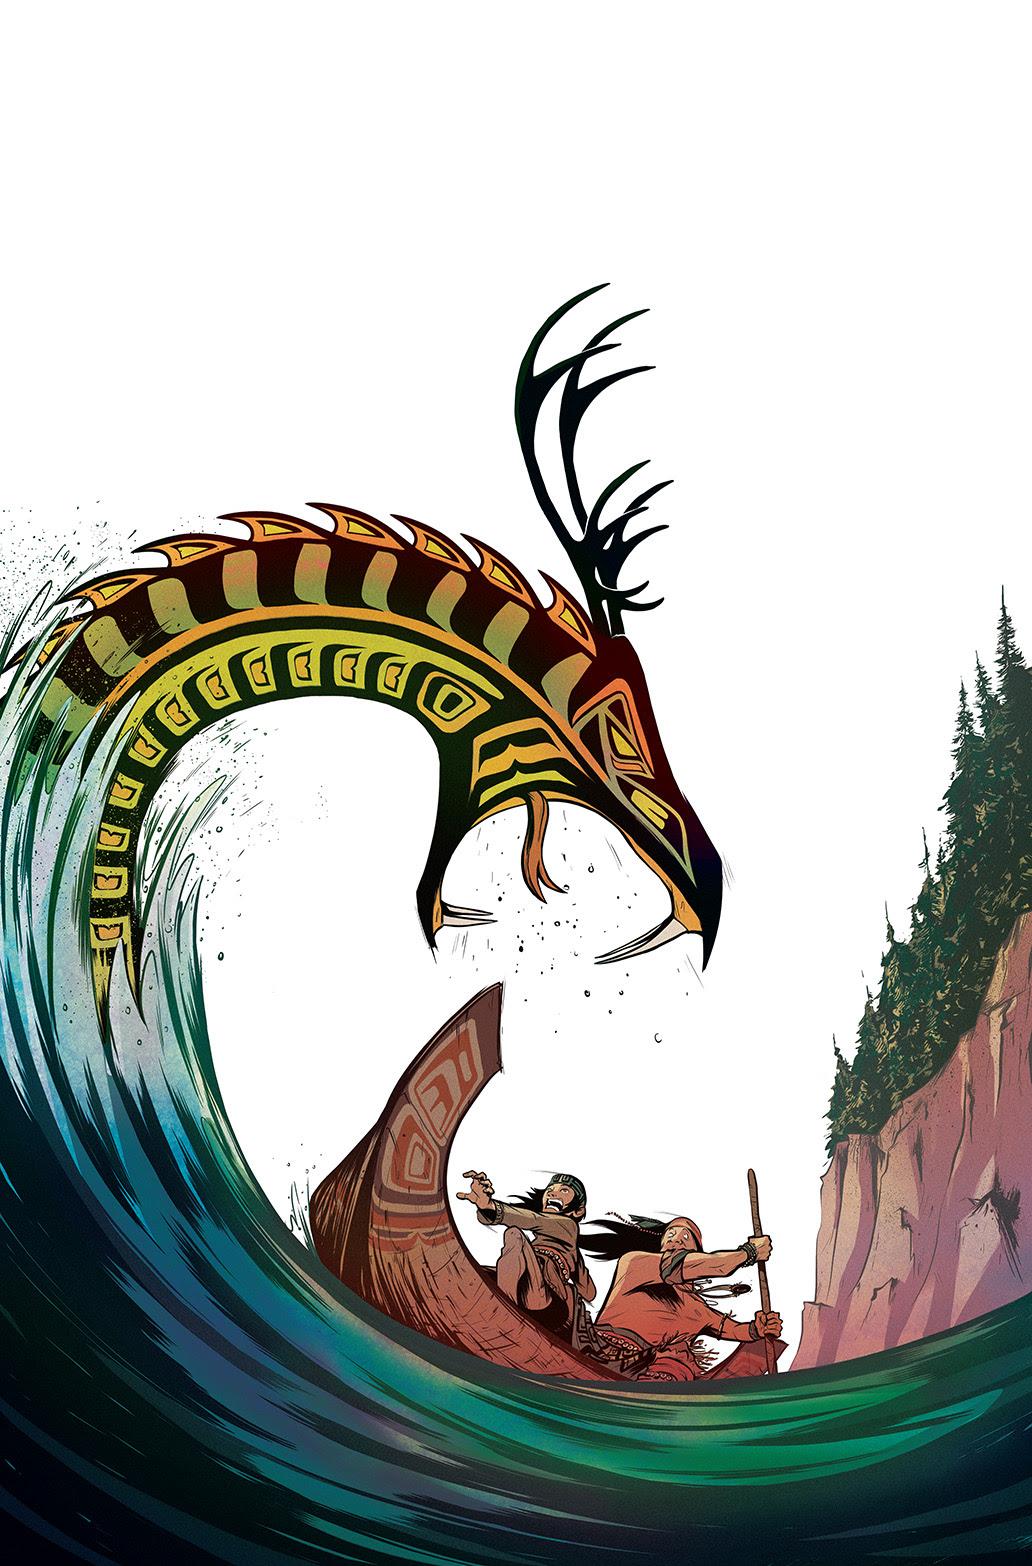 Jim Hensons The Storyteller Dragons Series Cover Gallery